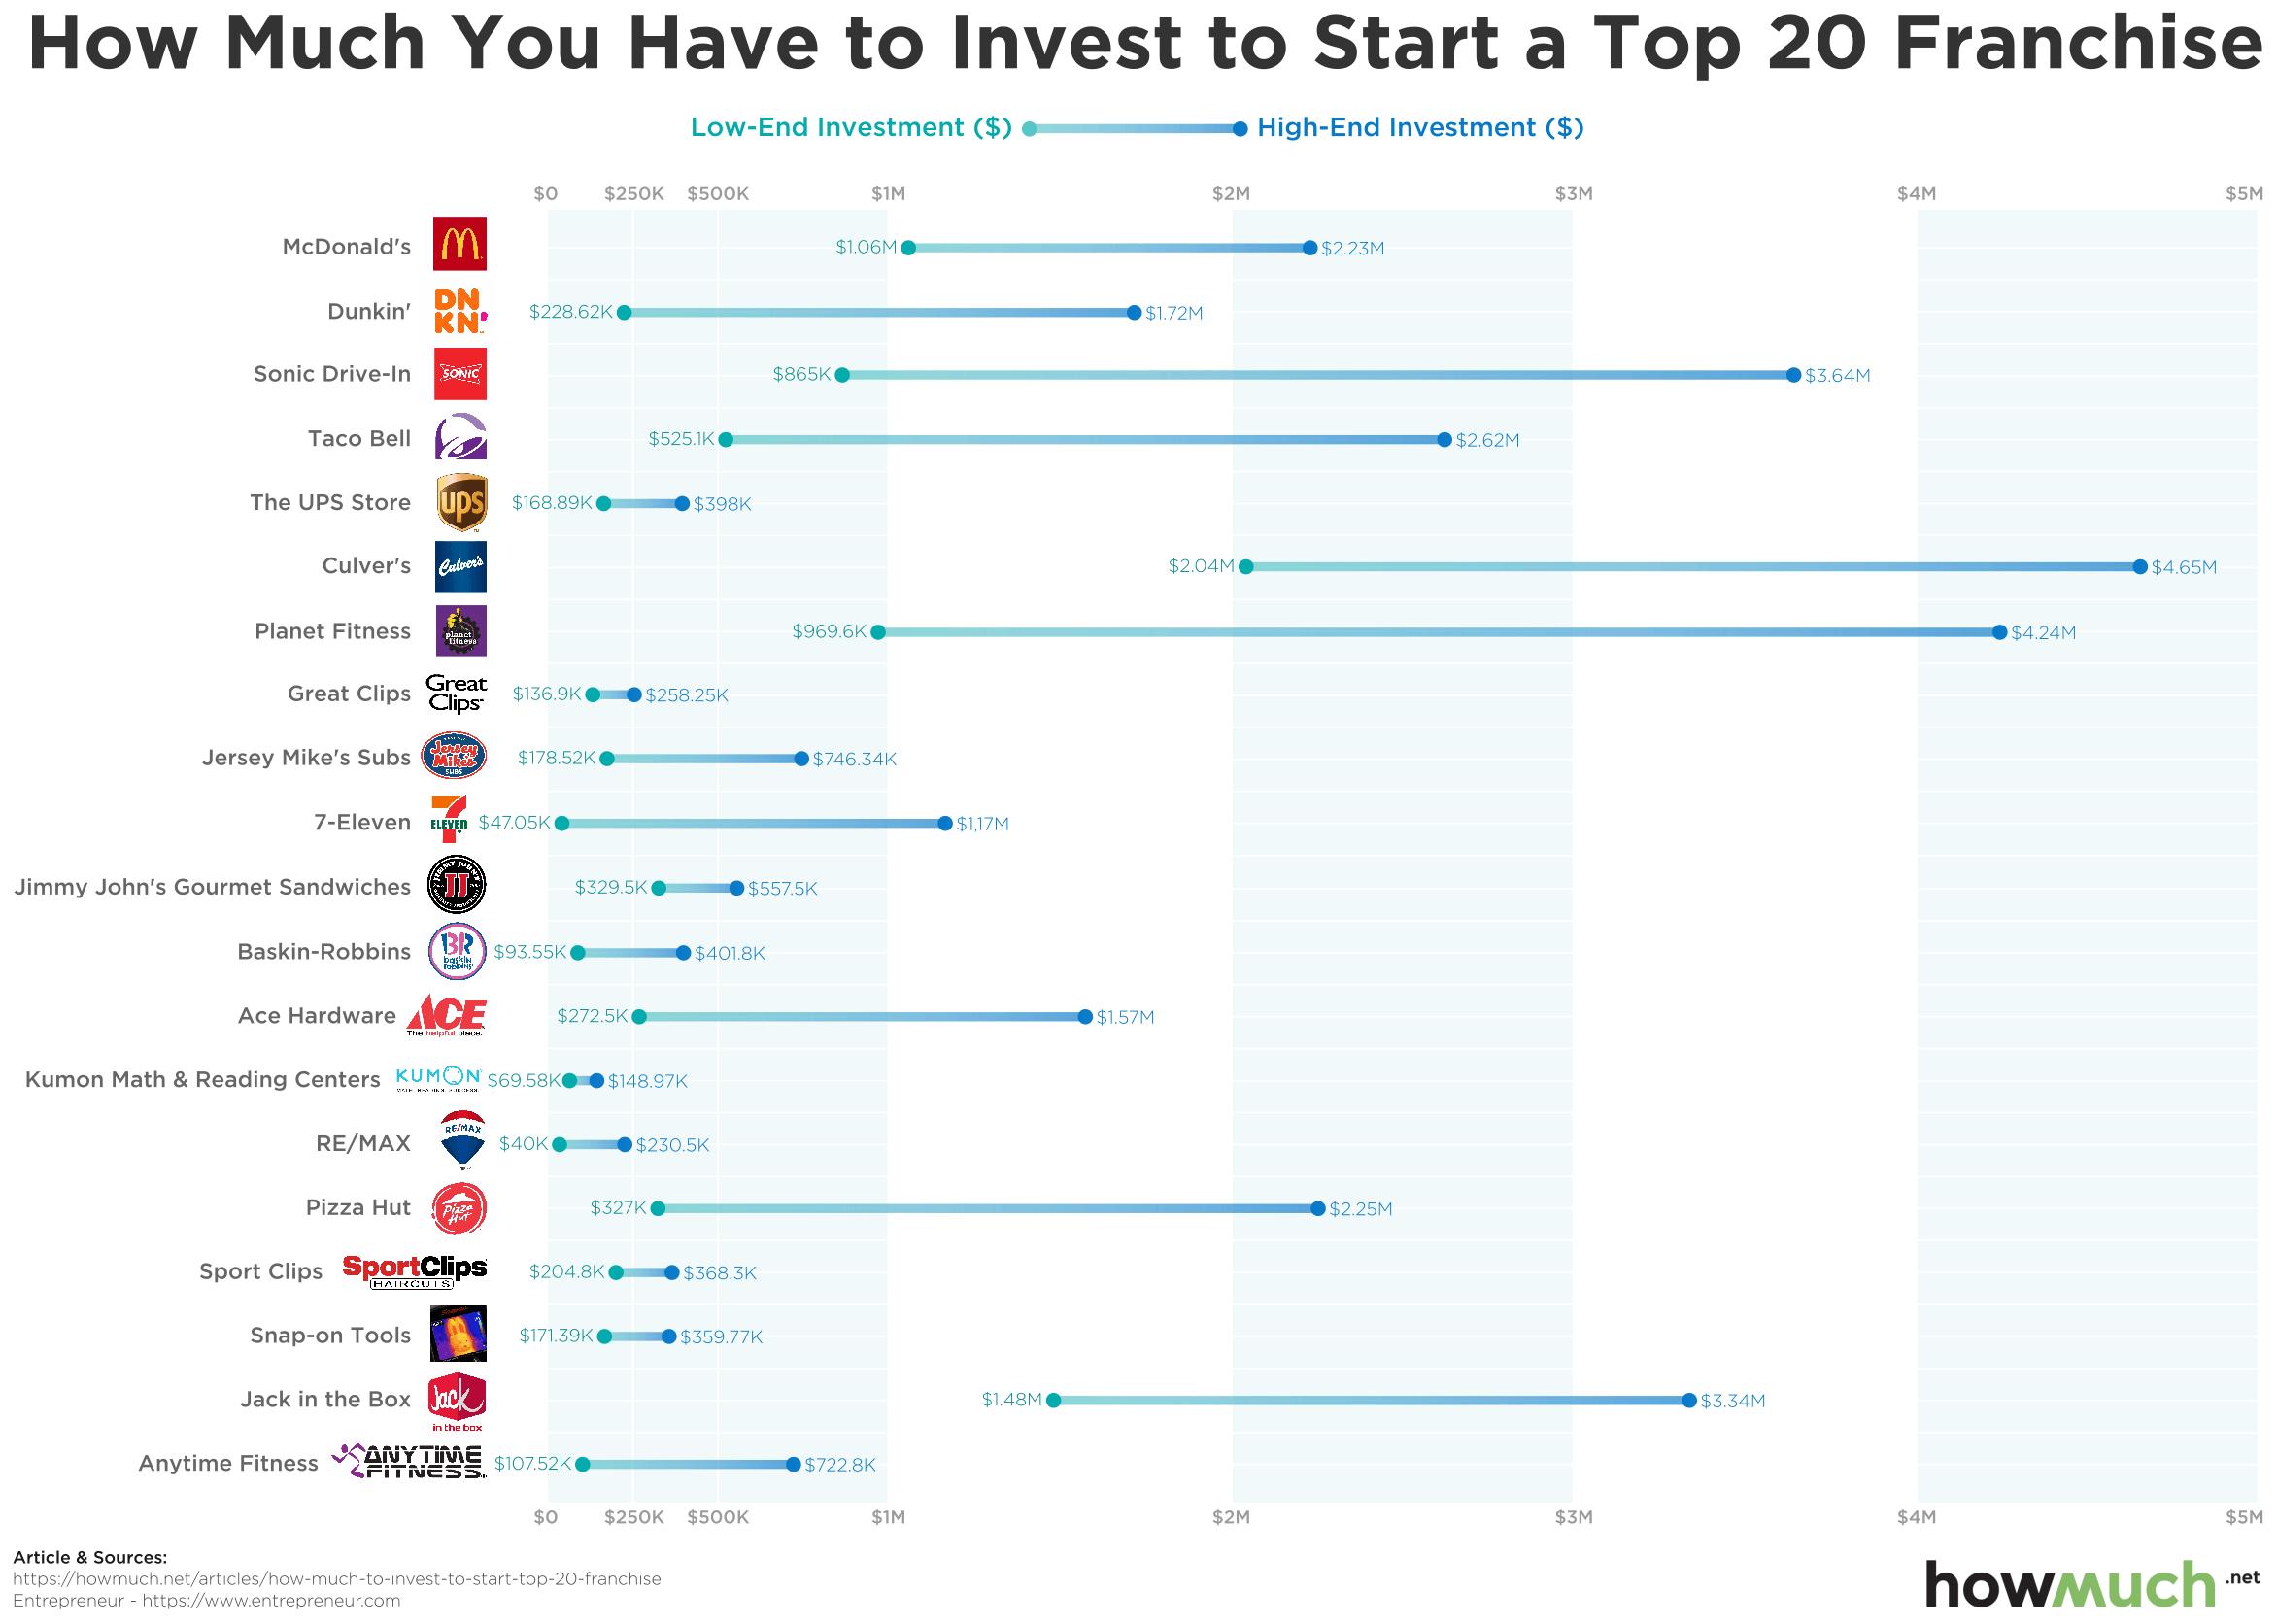 Top 20 Franchises